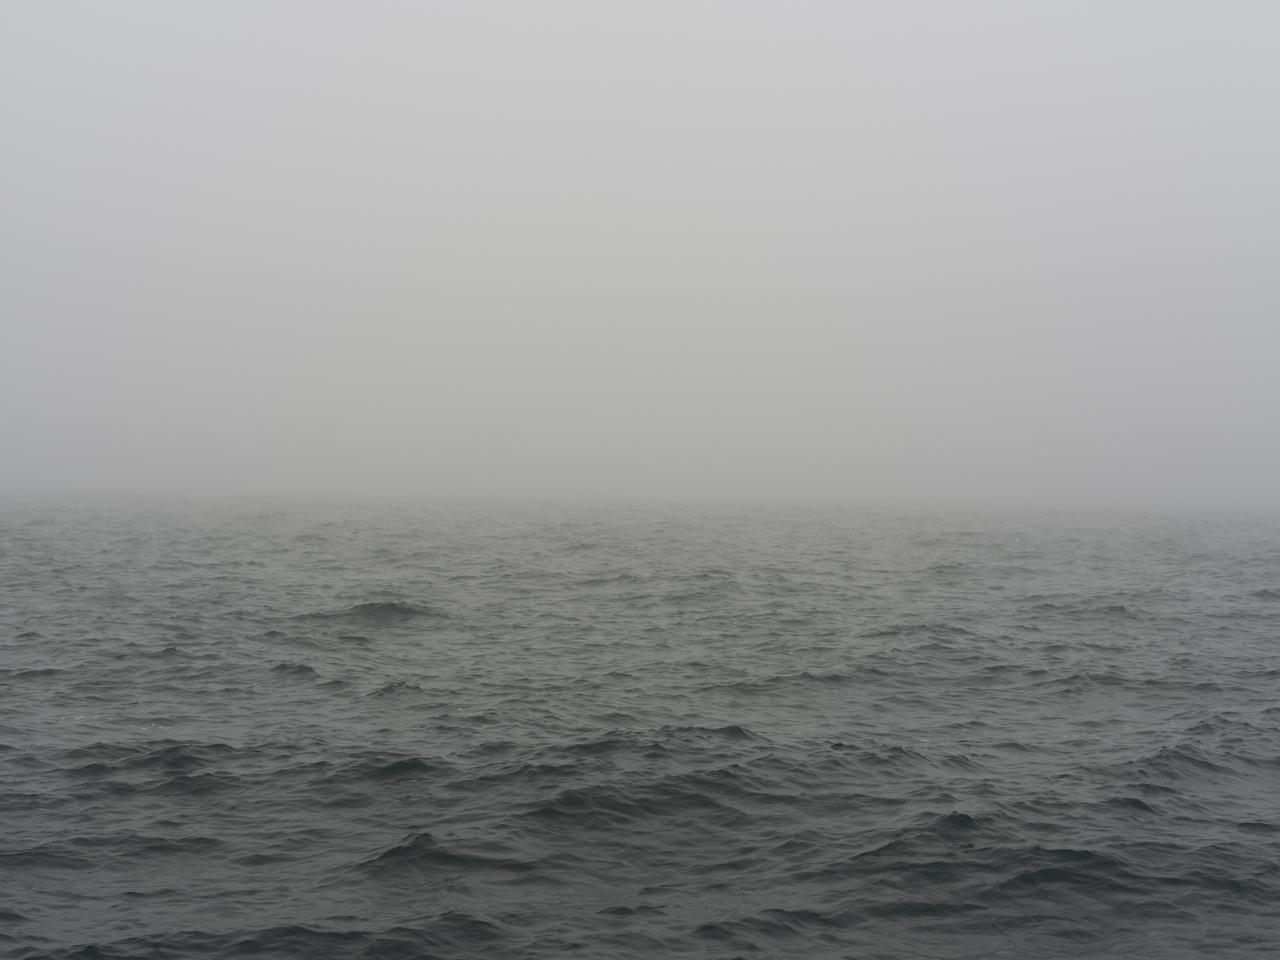 foggy and gray green day on Lake Michigan